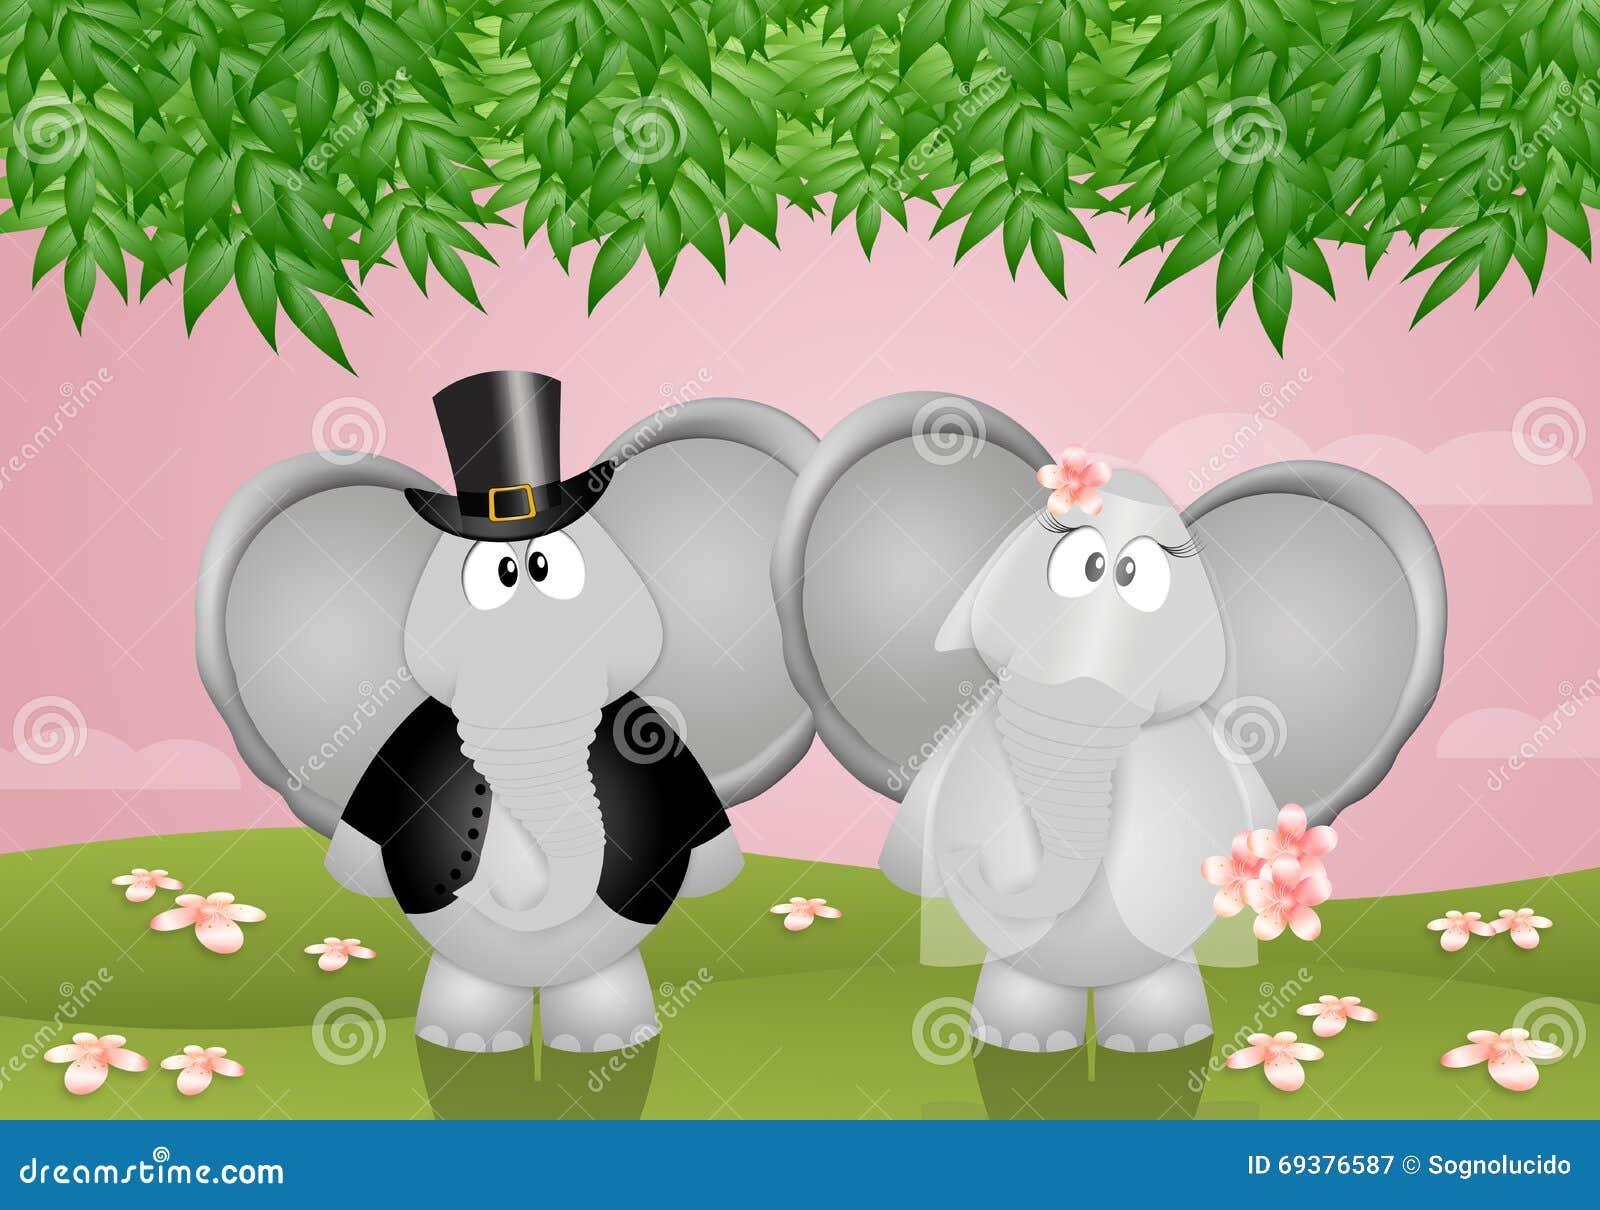 lustige elefanten geheiratet stock abbildung bild 69376587. Black Bedroom Furniture Sets. Home Design Ideas